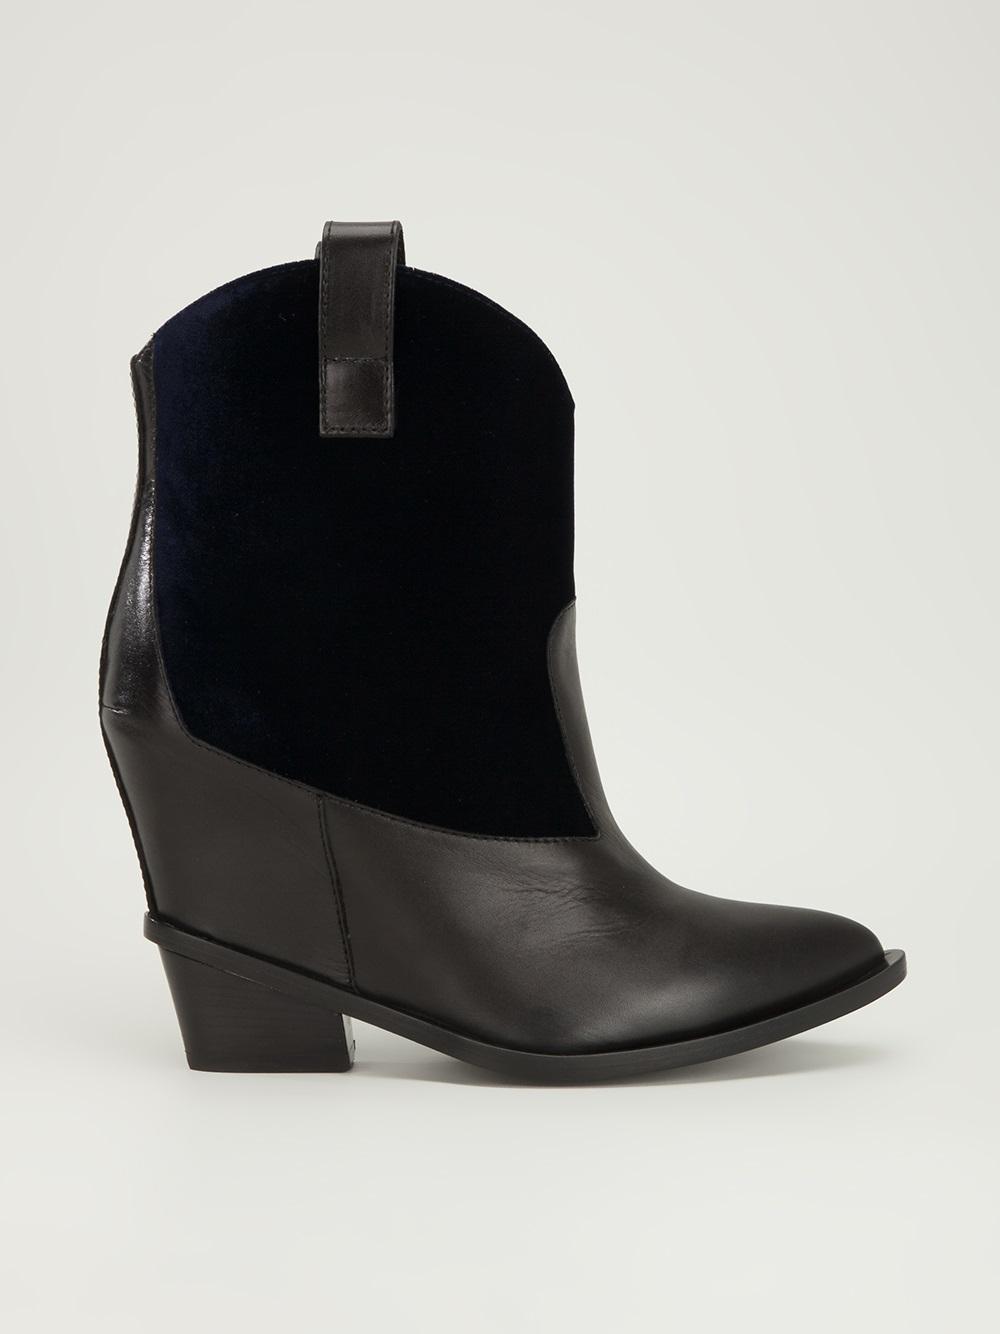 c059ab96cdc2 Lyst - Giuseppe Zanotti Wedge Cowboy Boot in Blue